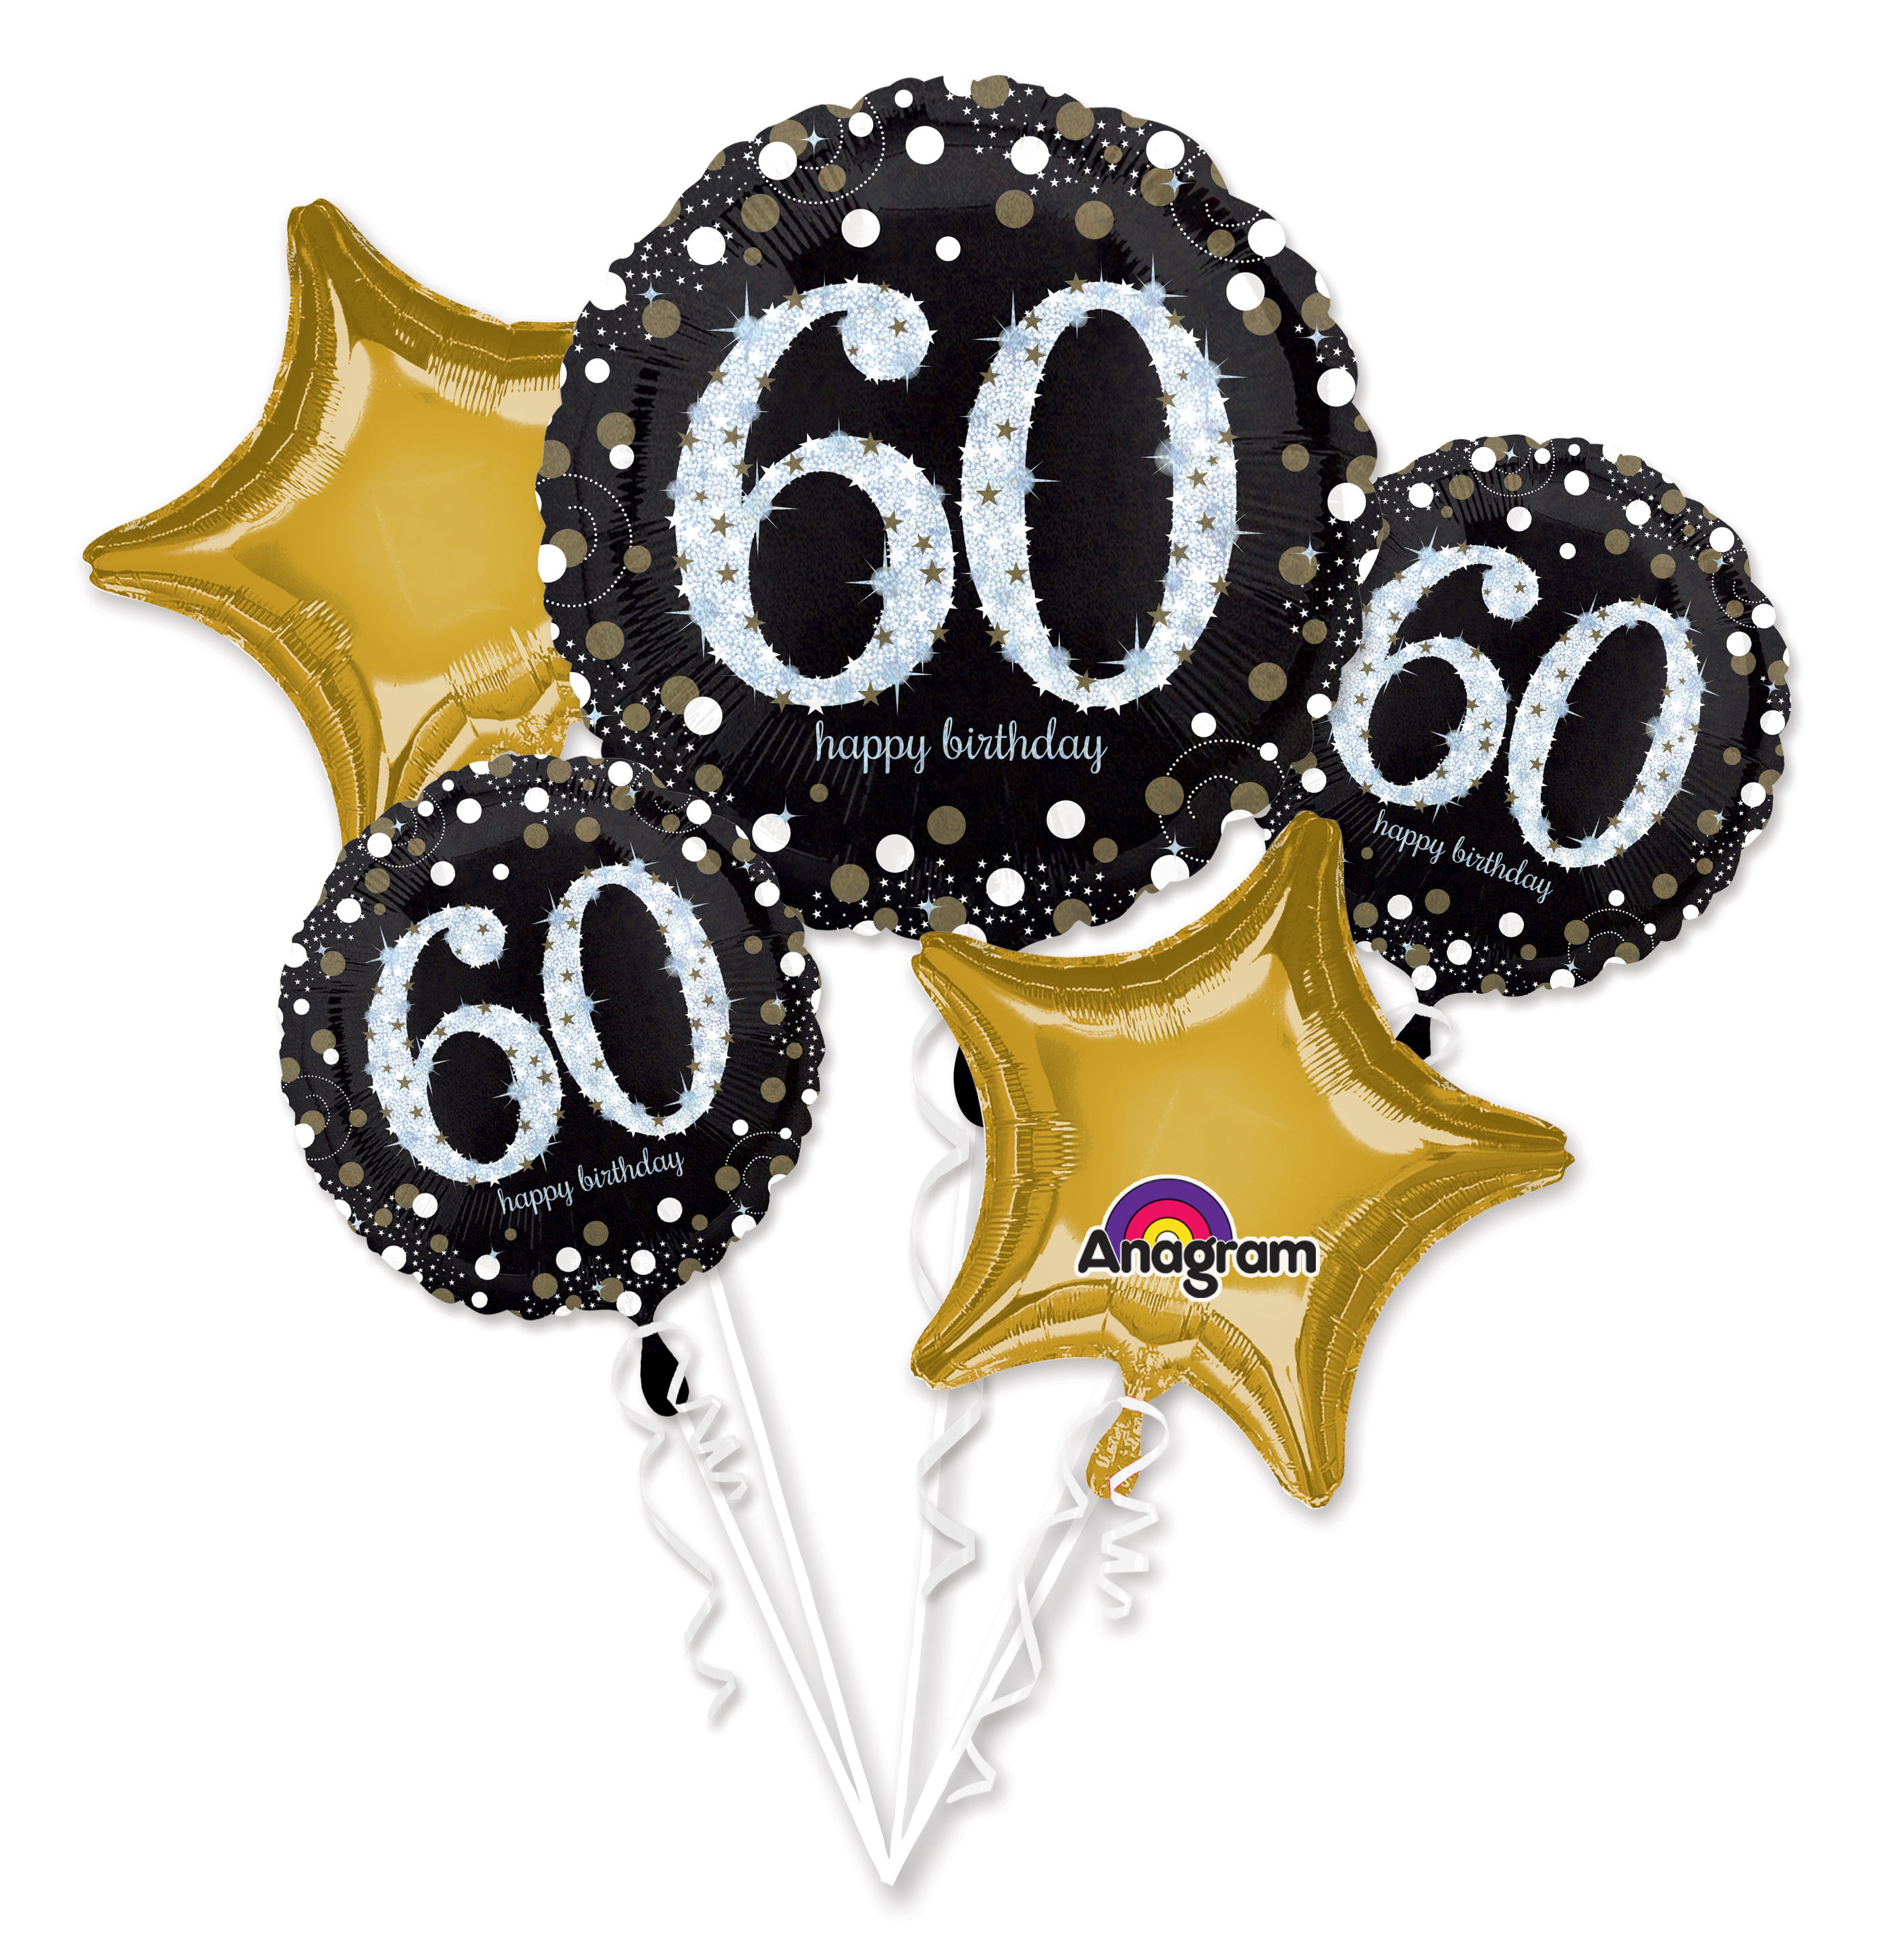 Bouquet Sparkling Birthday 60 Balloon Packaged